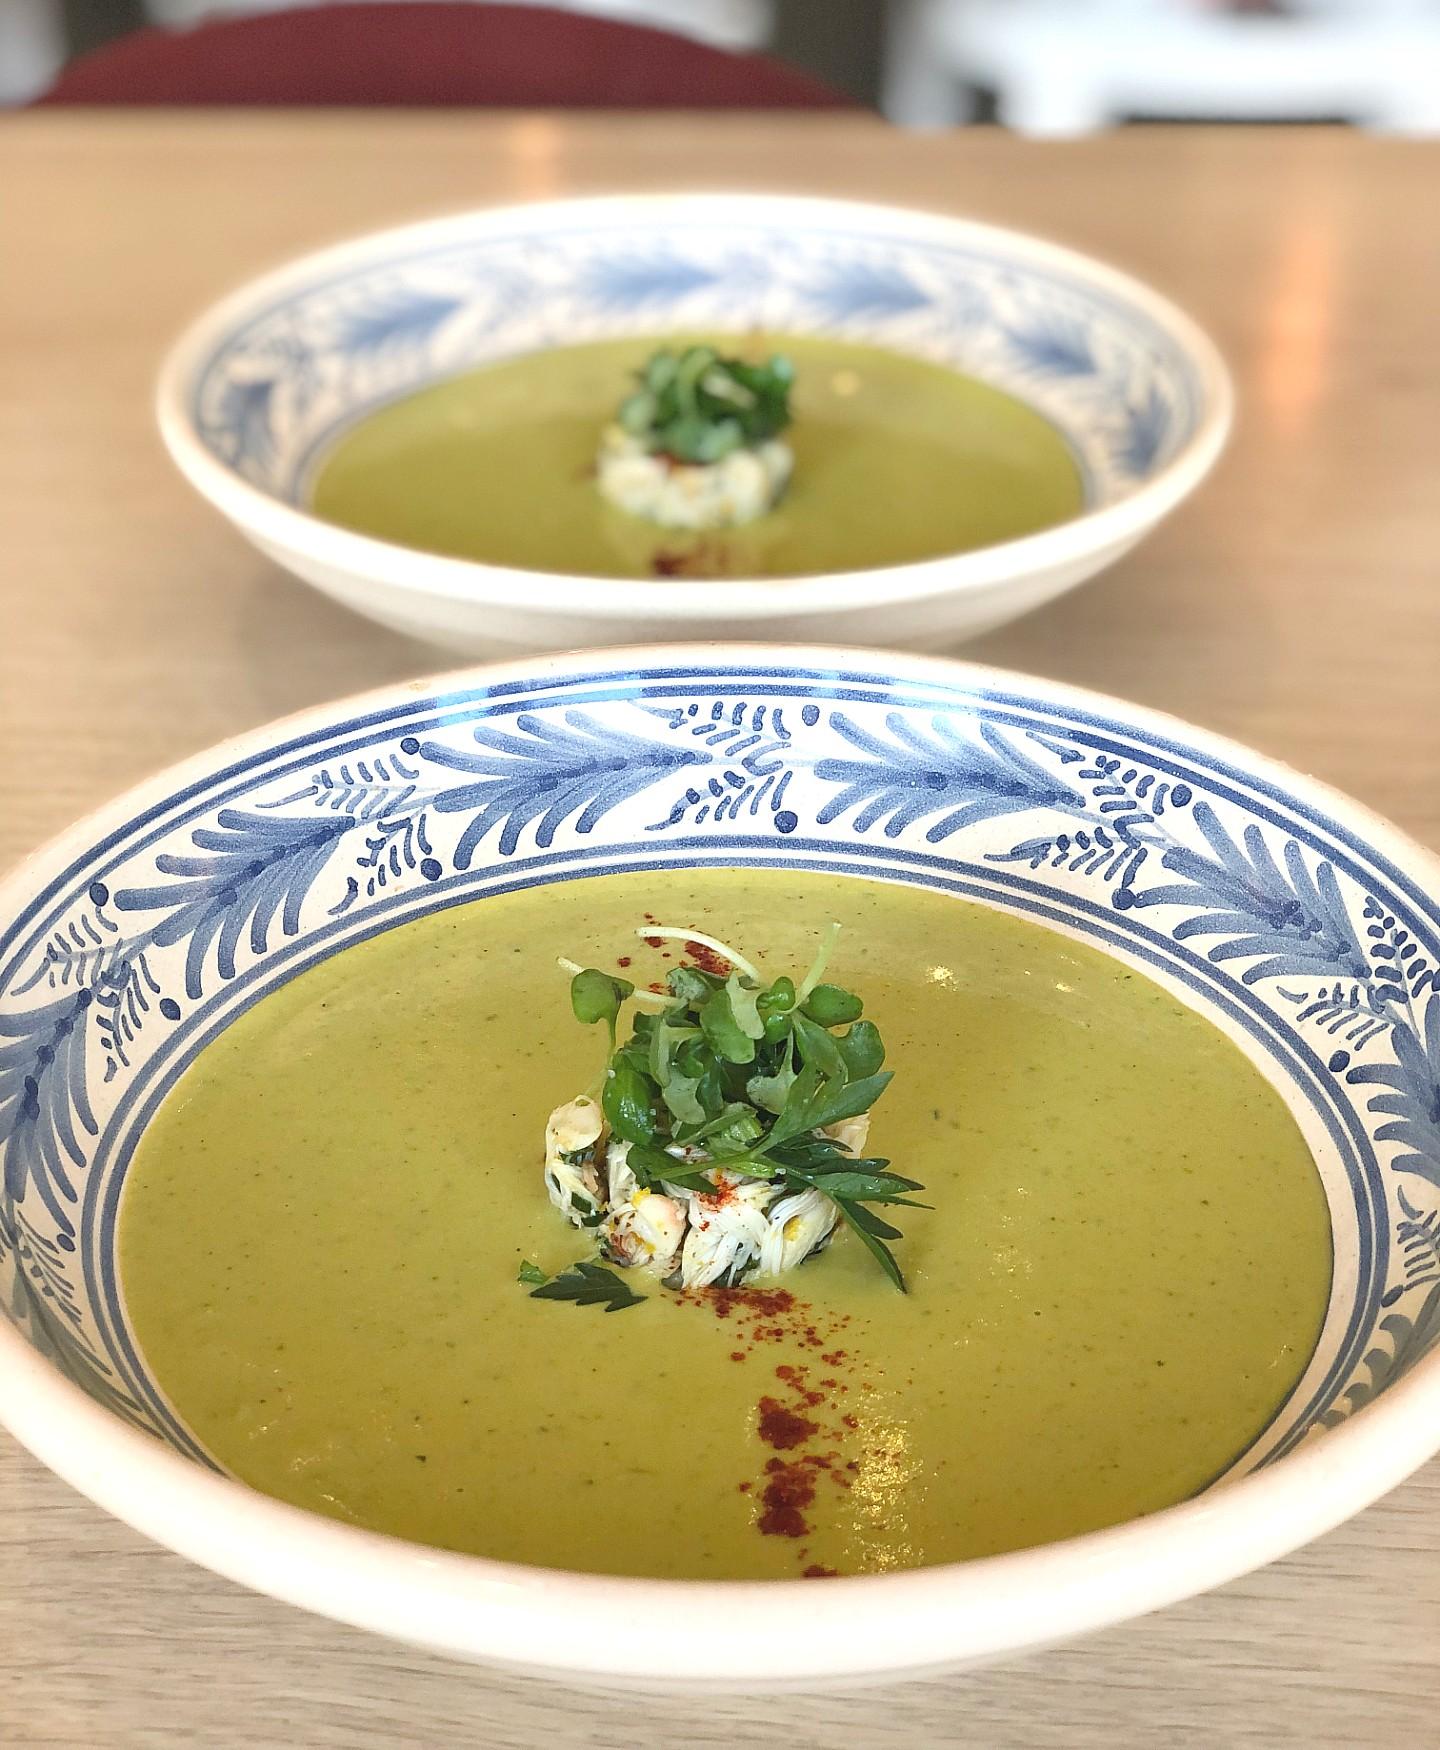 Soup at Bottiglia Cucina - Italian Food Henderson